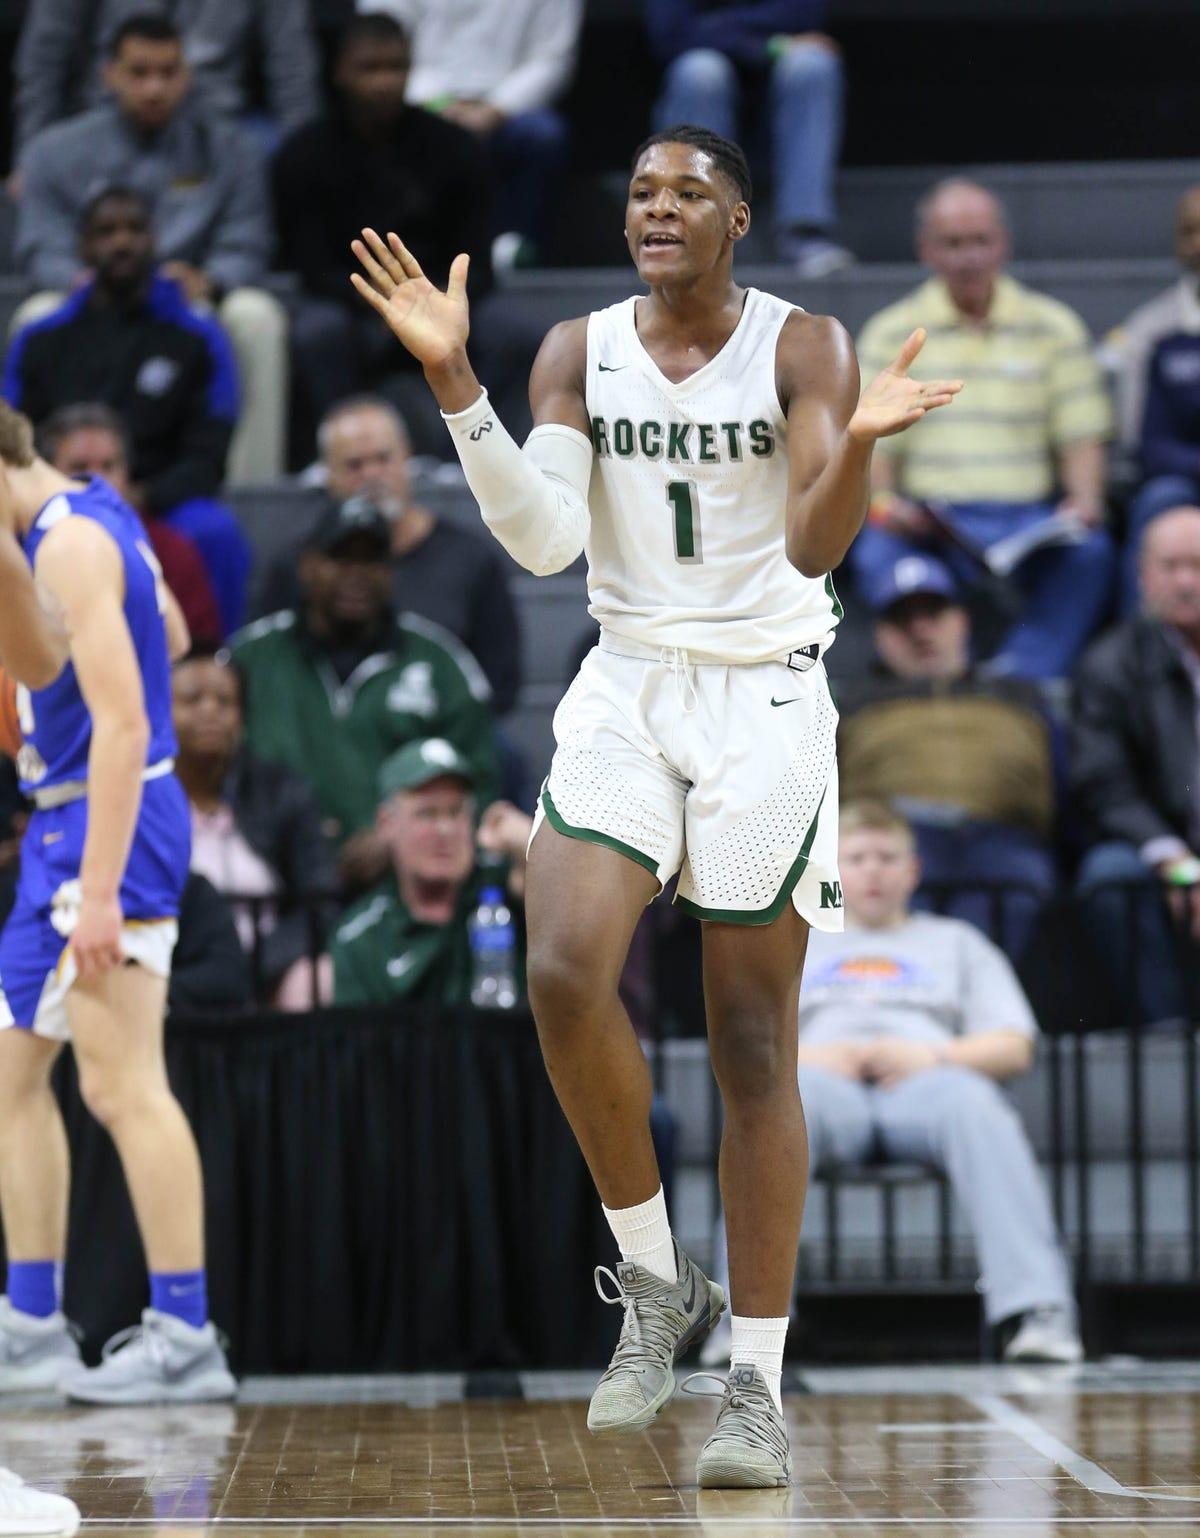 Michigan boys basketball: Romeo Weems tops Top 100 players